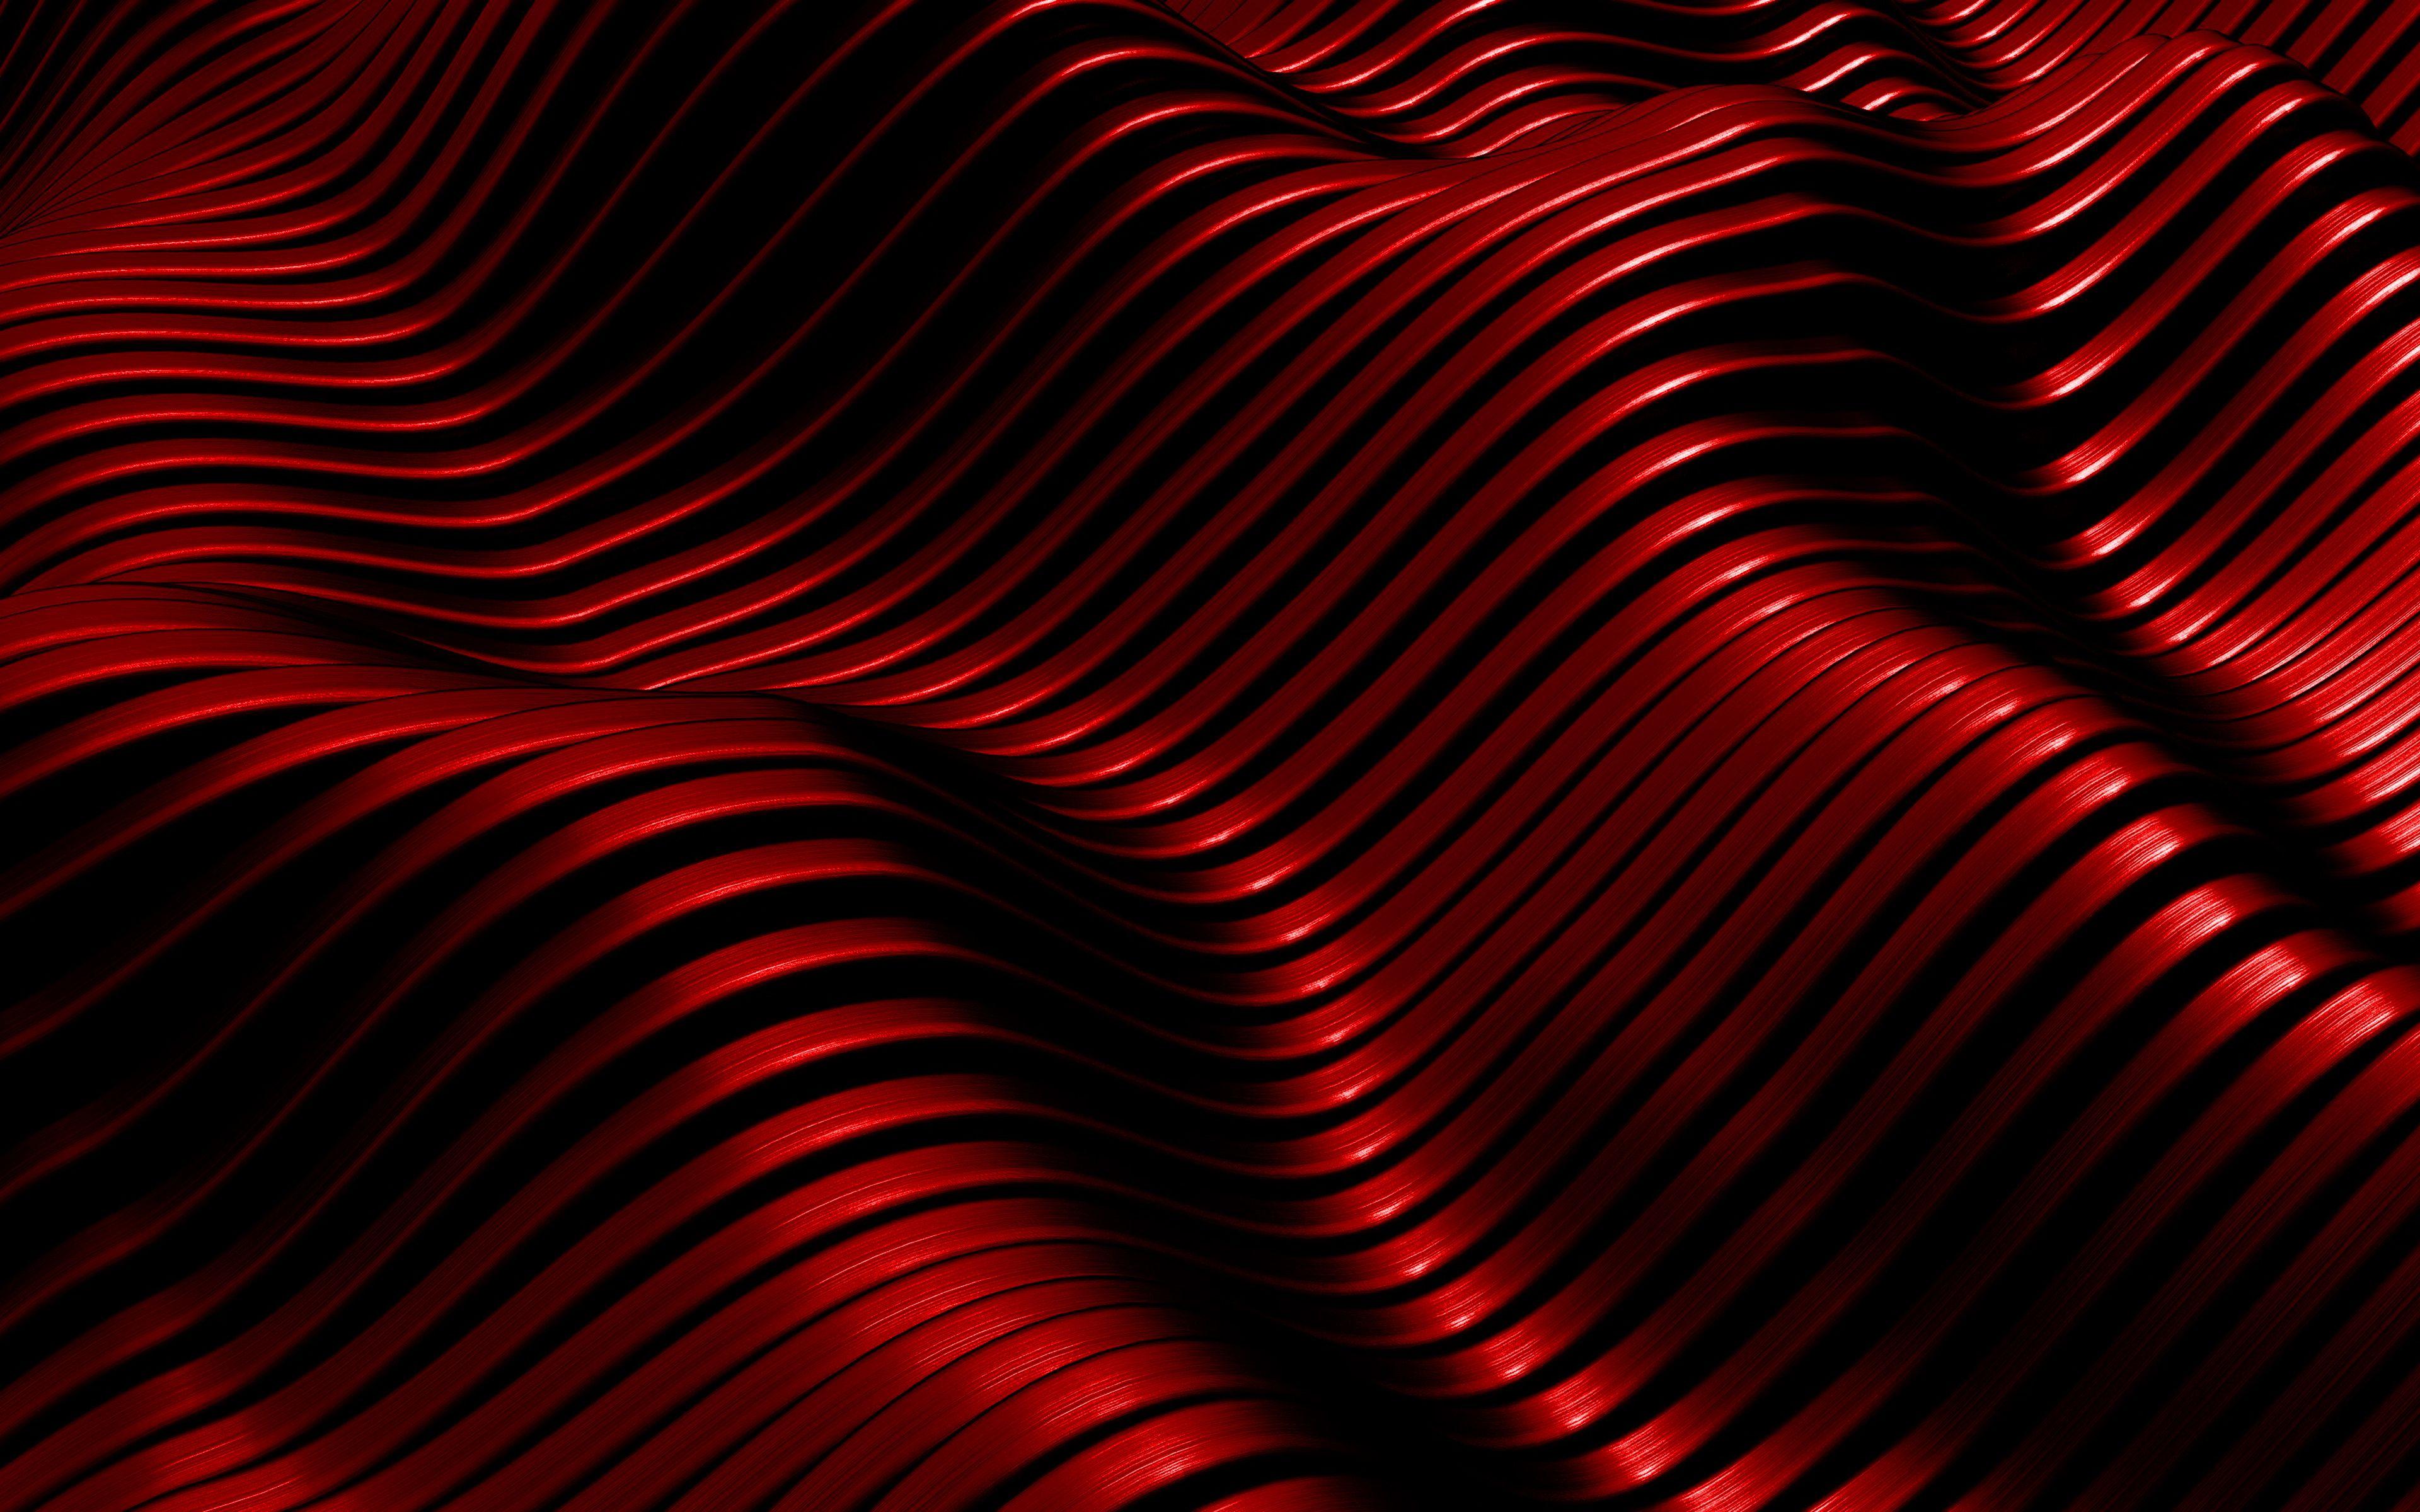 Red Metal Texture 4k Background Metal Texture Red Metal Texture